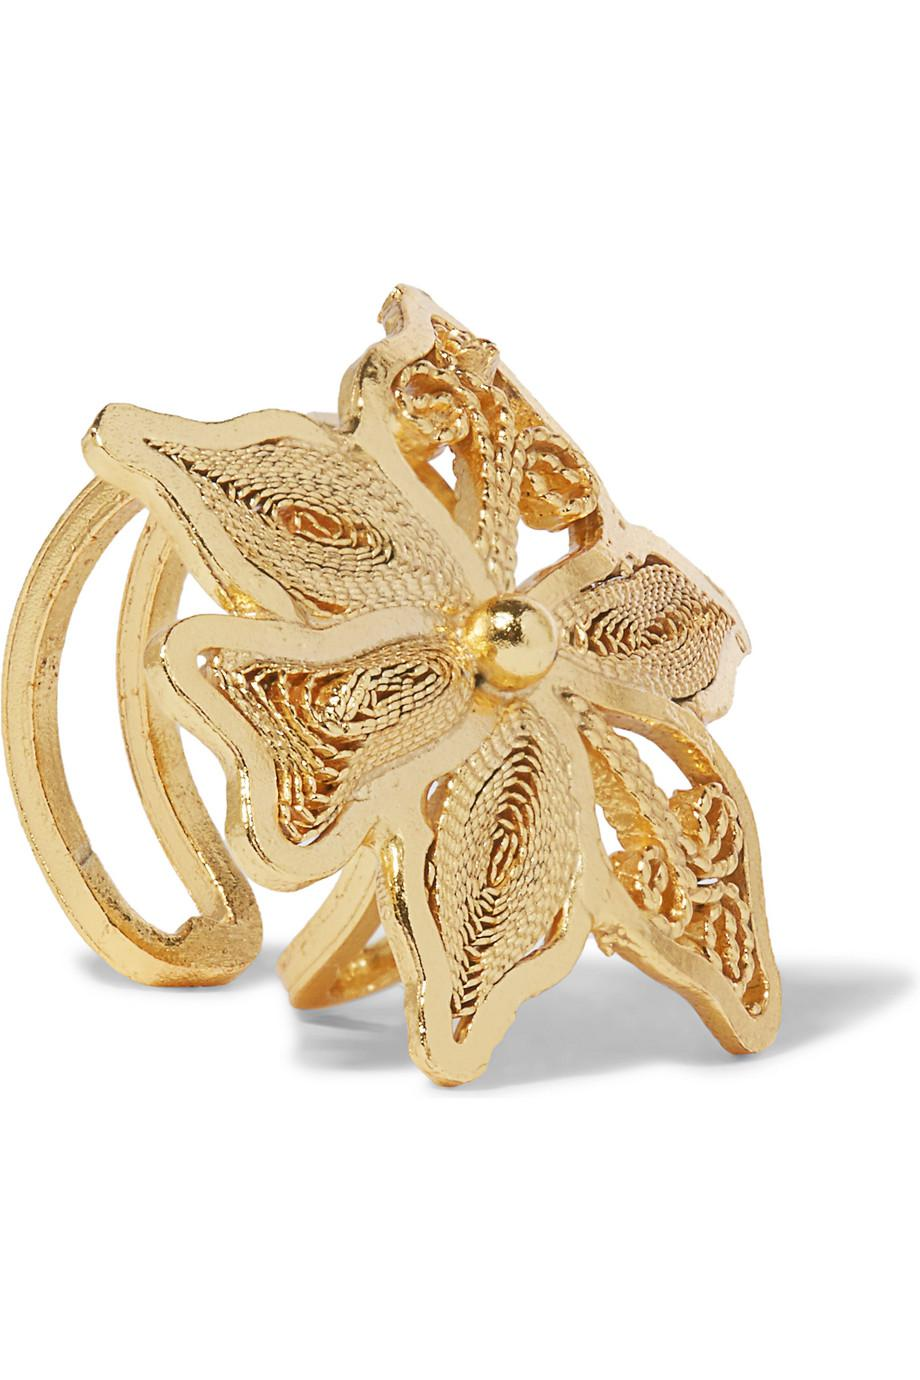 Mallarino Oriana Set Of Three Gold Vermeil Ear Cuffs And Earring 8CN4x4Rv